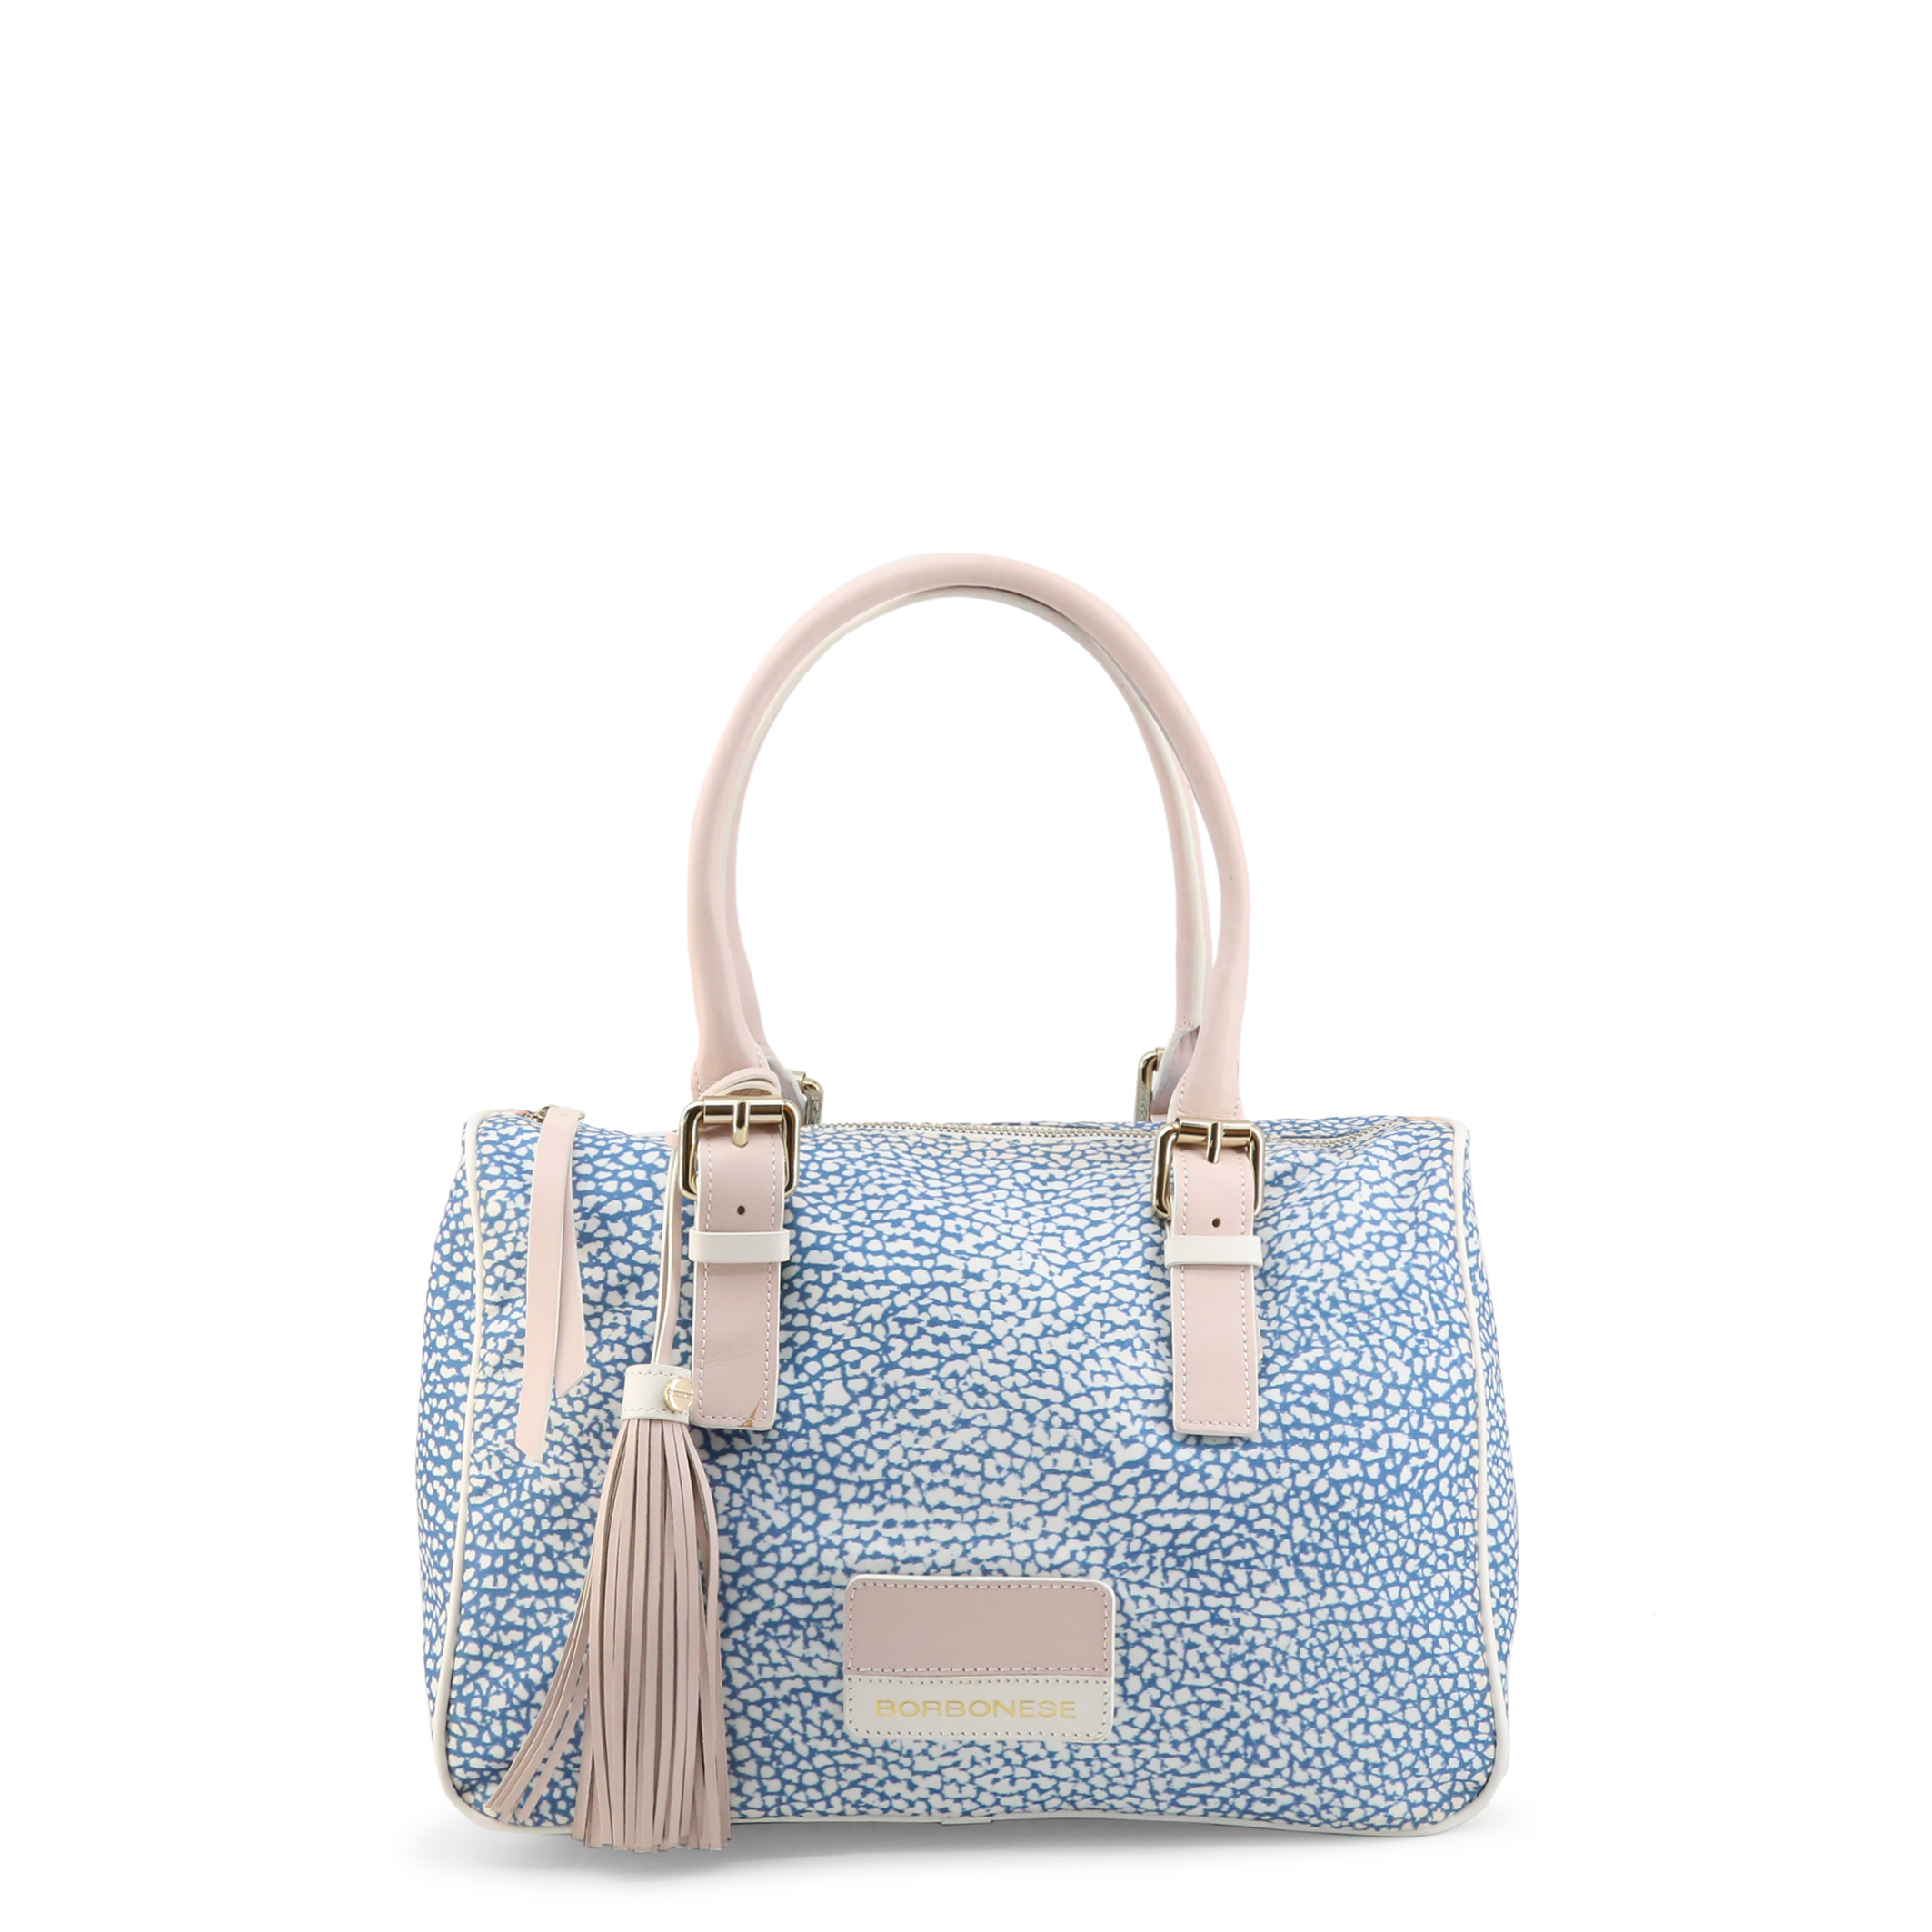 Borbonese - 903819-232 - Blue